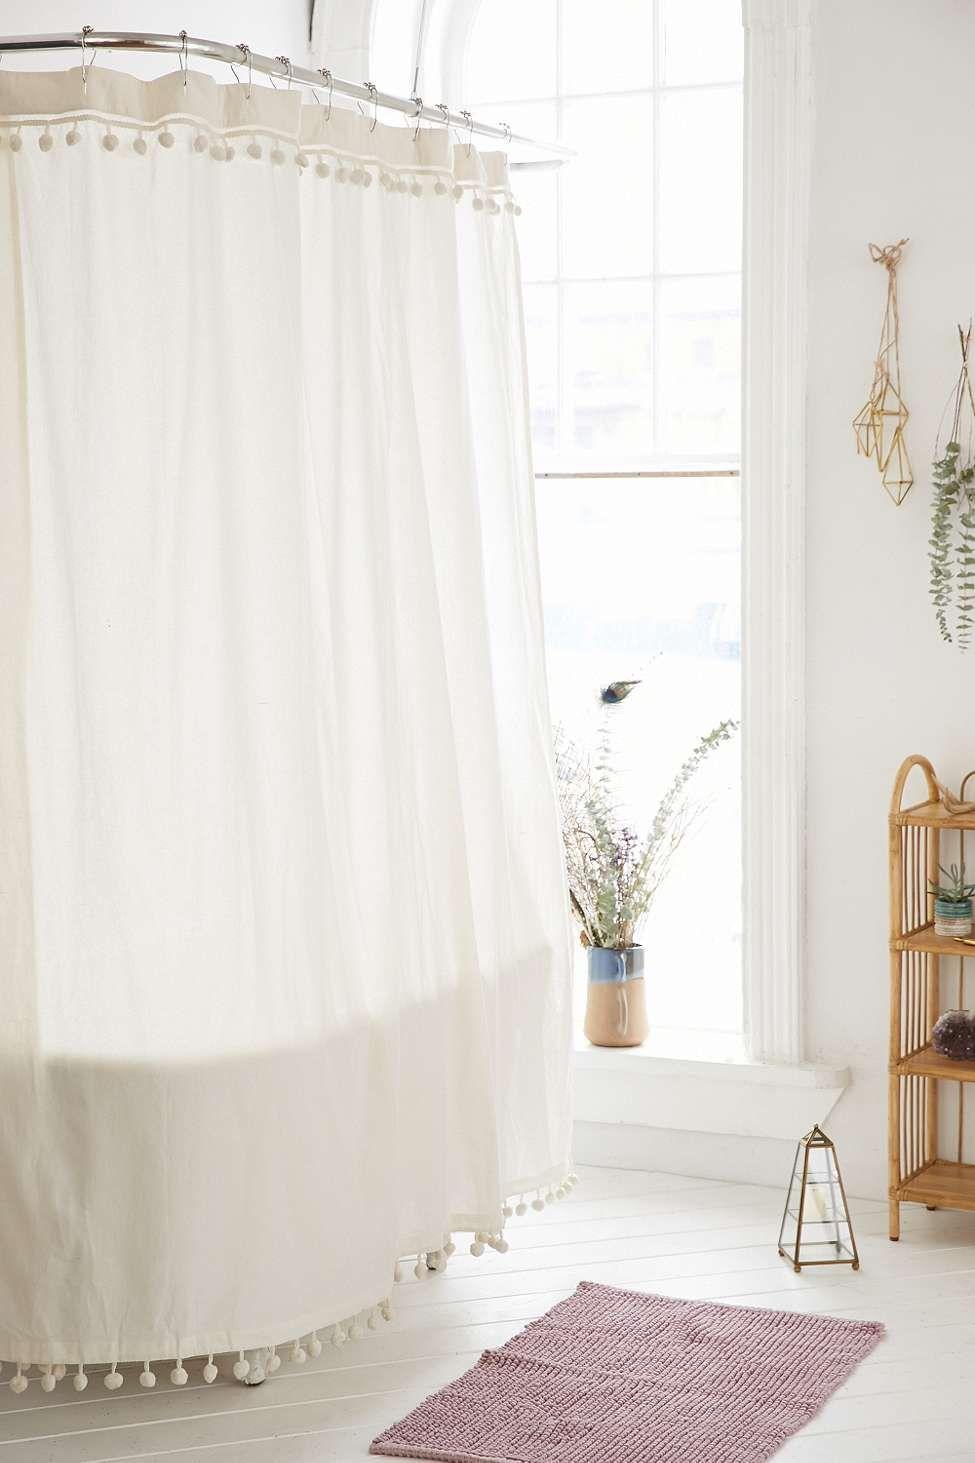 Duschvorhang In Weiss Mit Bommeln Curtains Magical Thinking